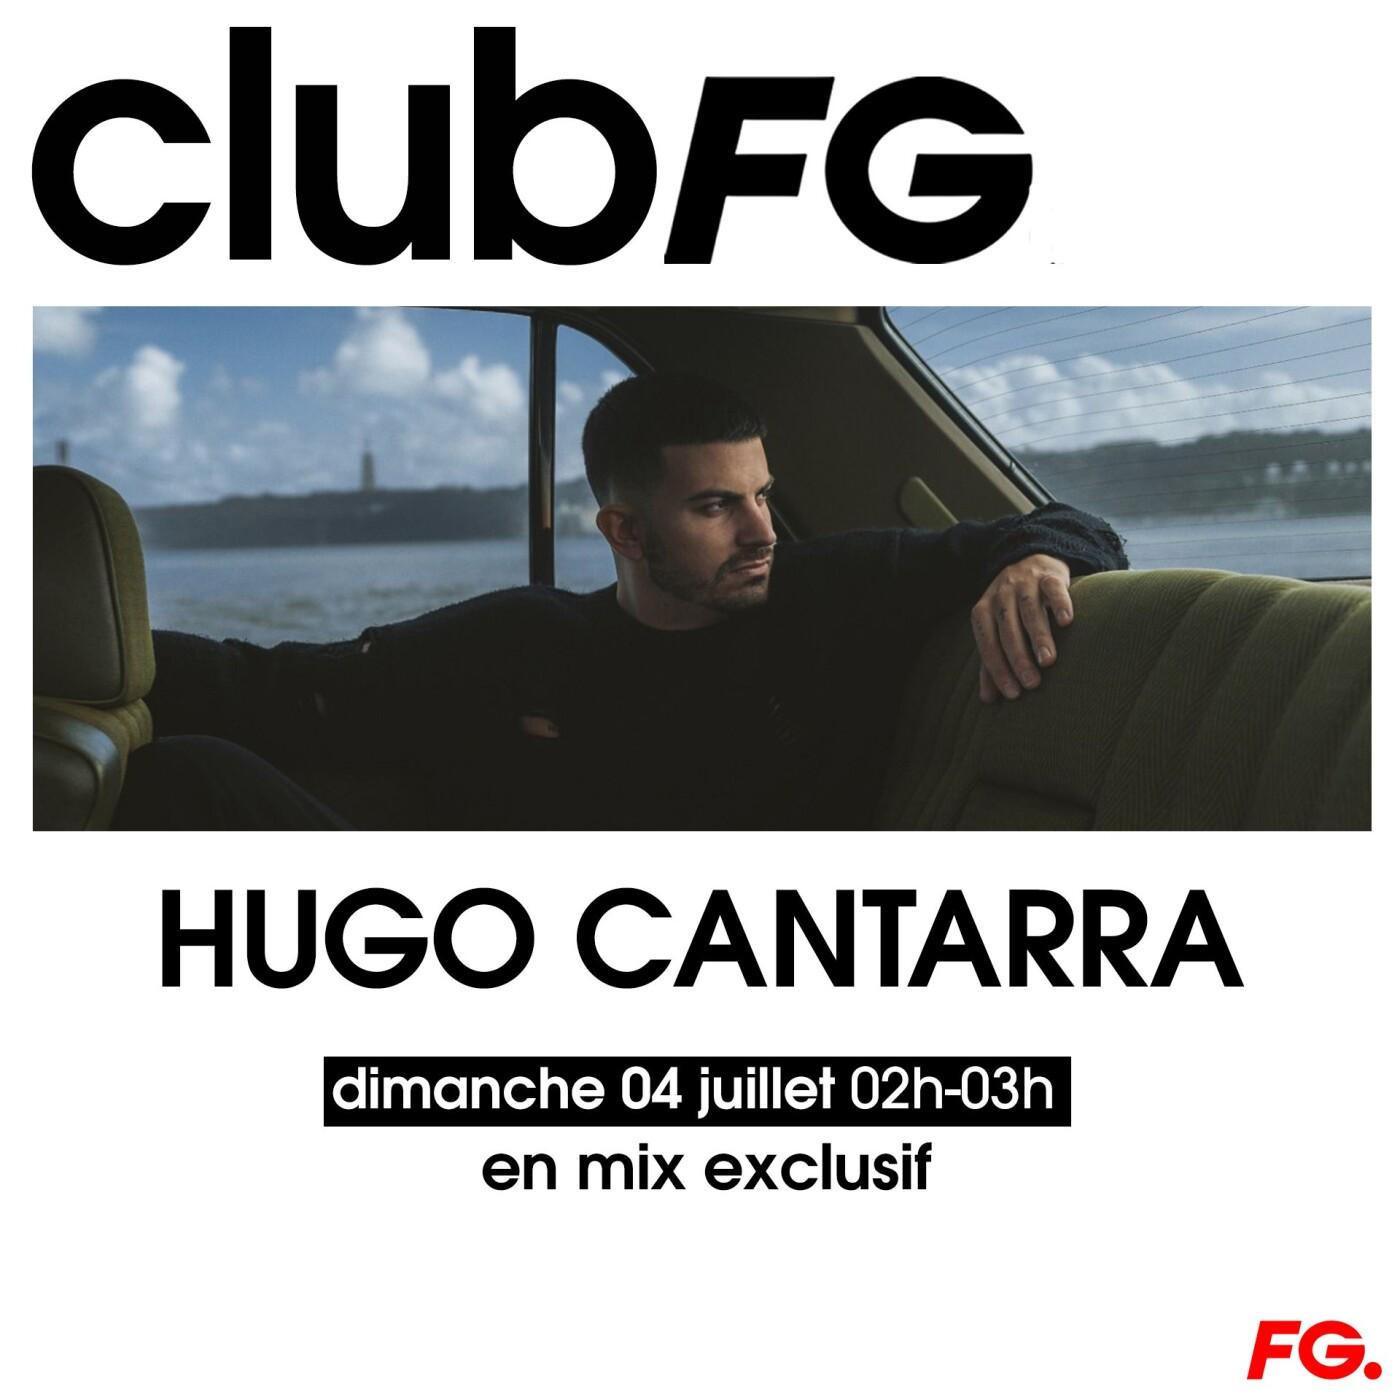 CLUB FG : HUGO CANTARRA